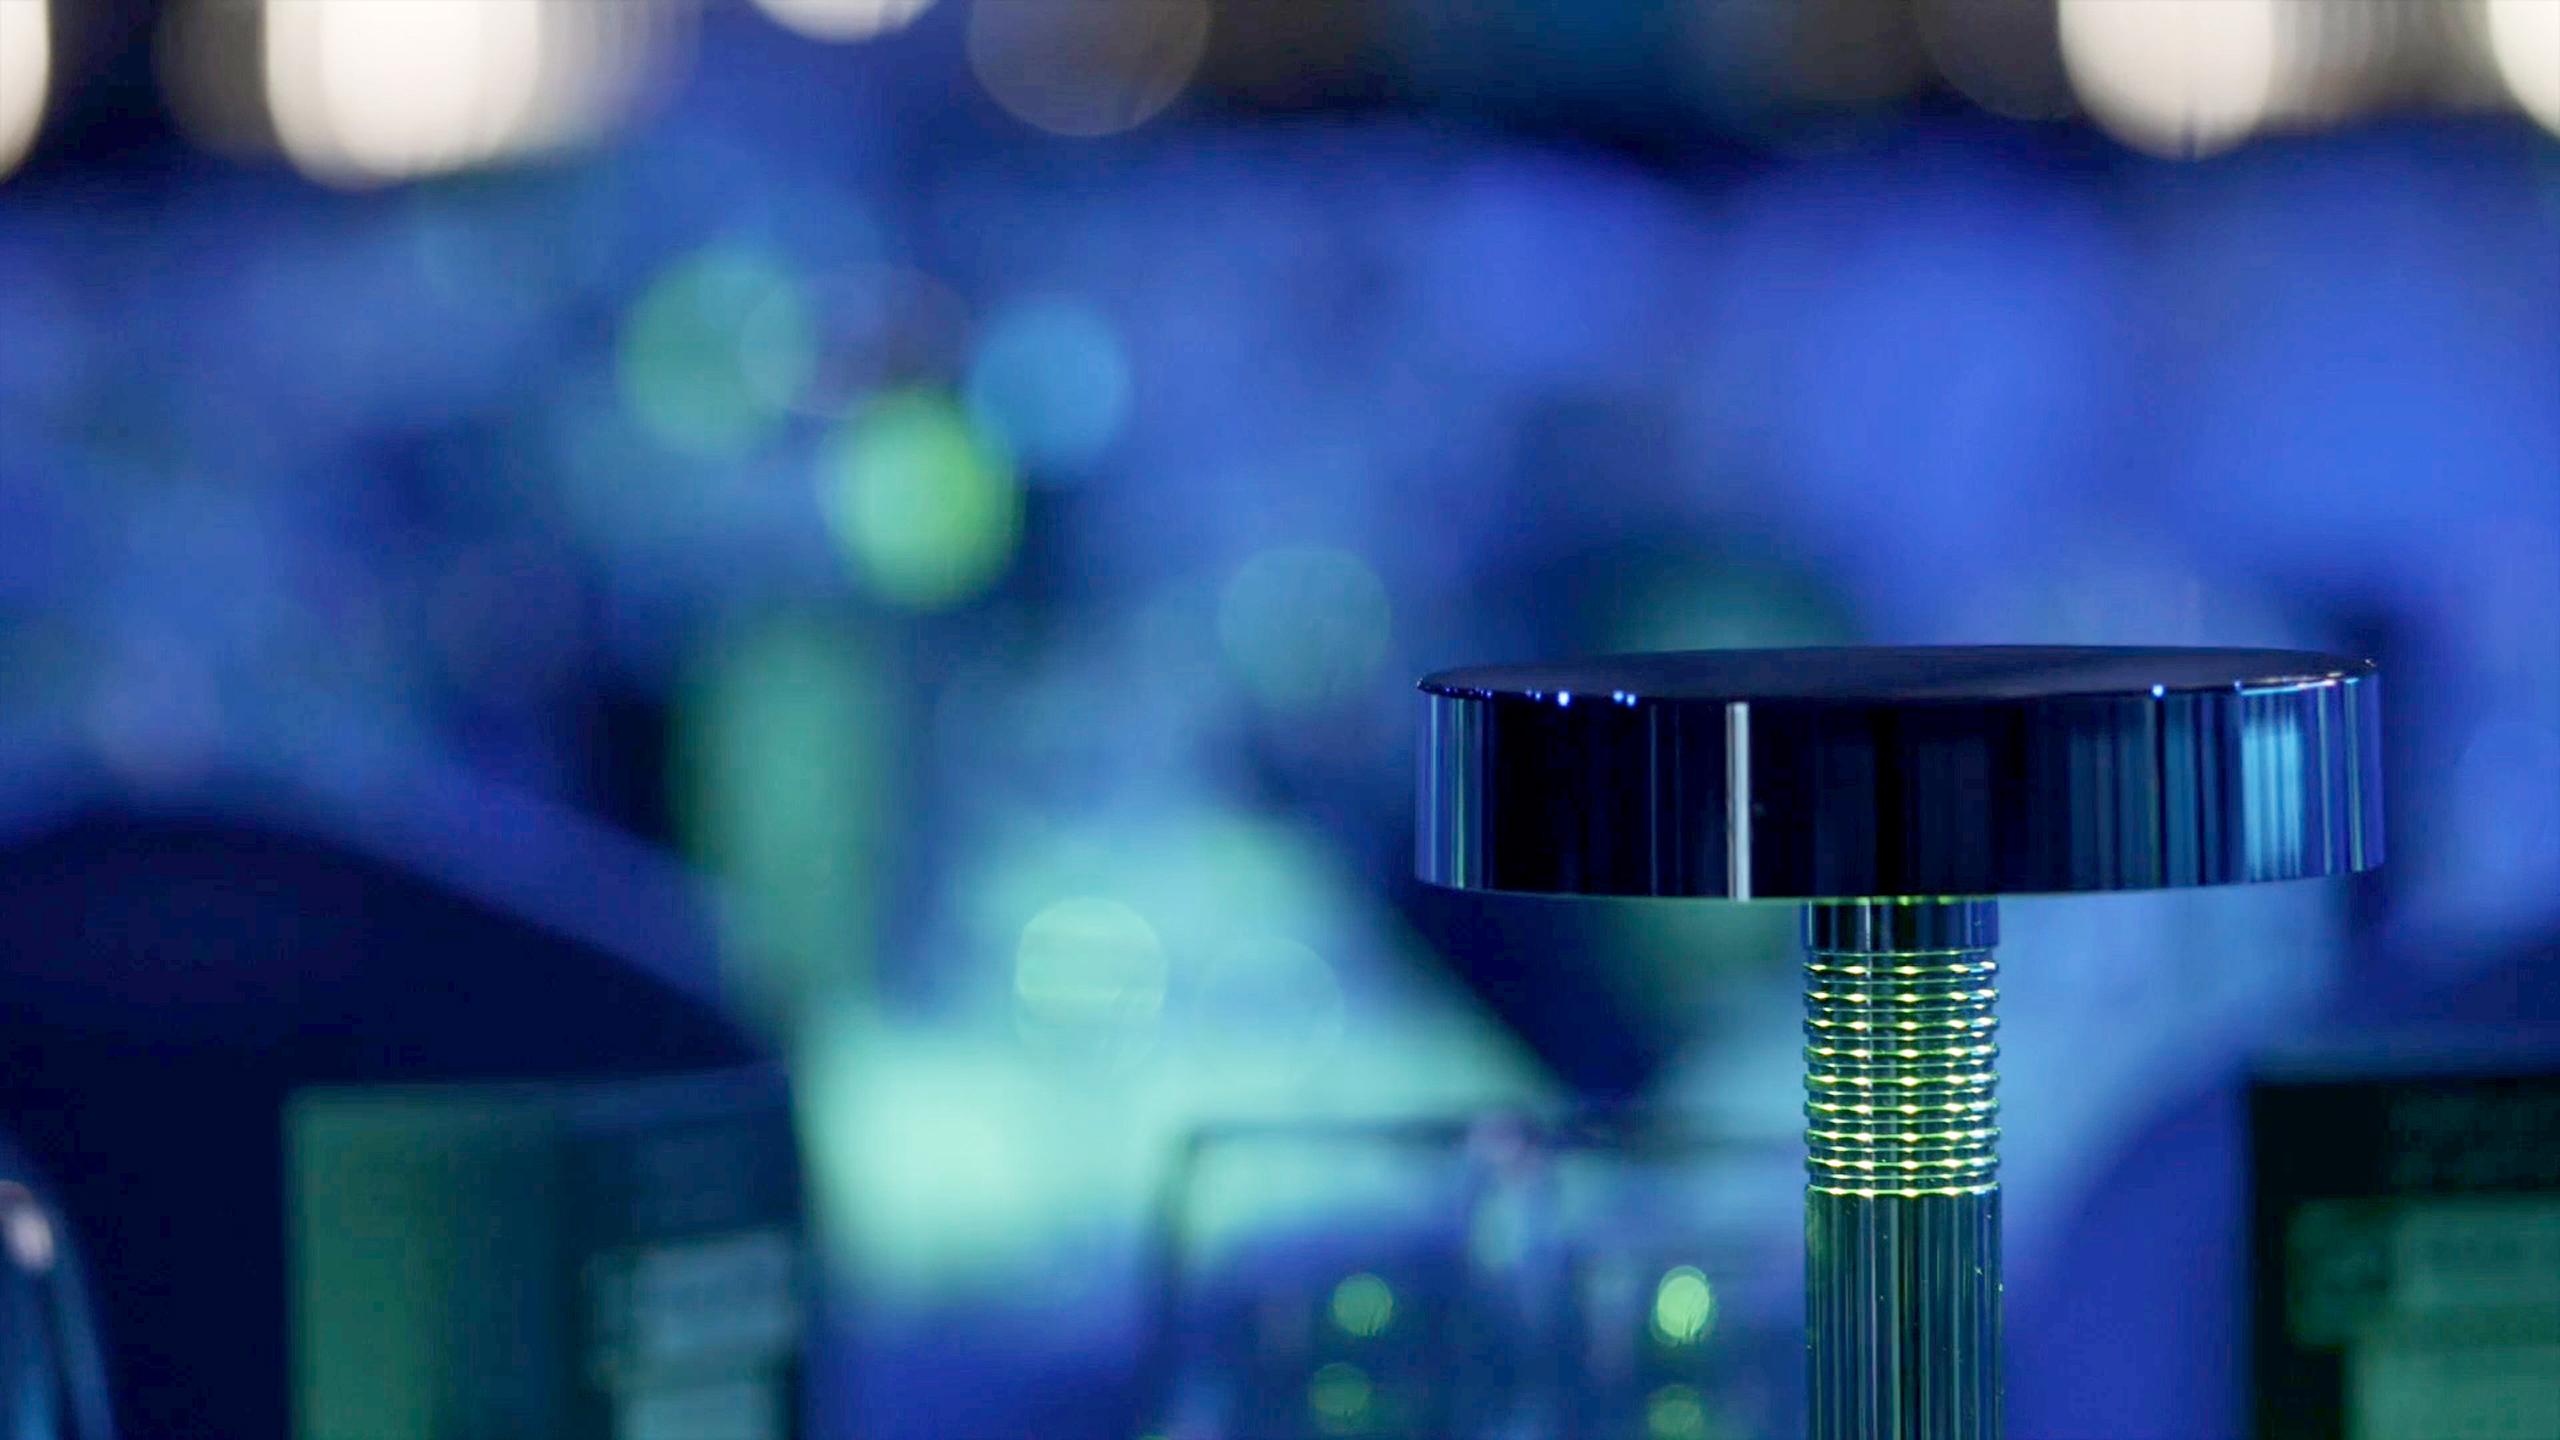 Novatech Creative Event Technology extends its Prolight product range